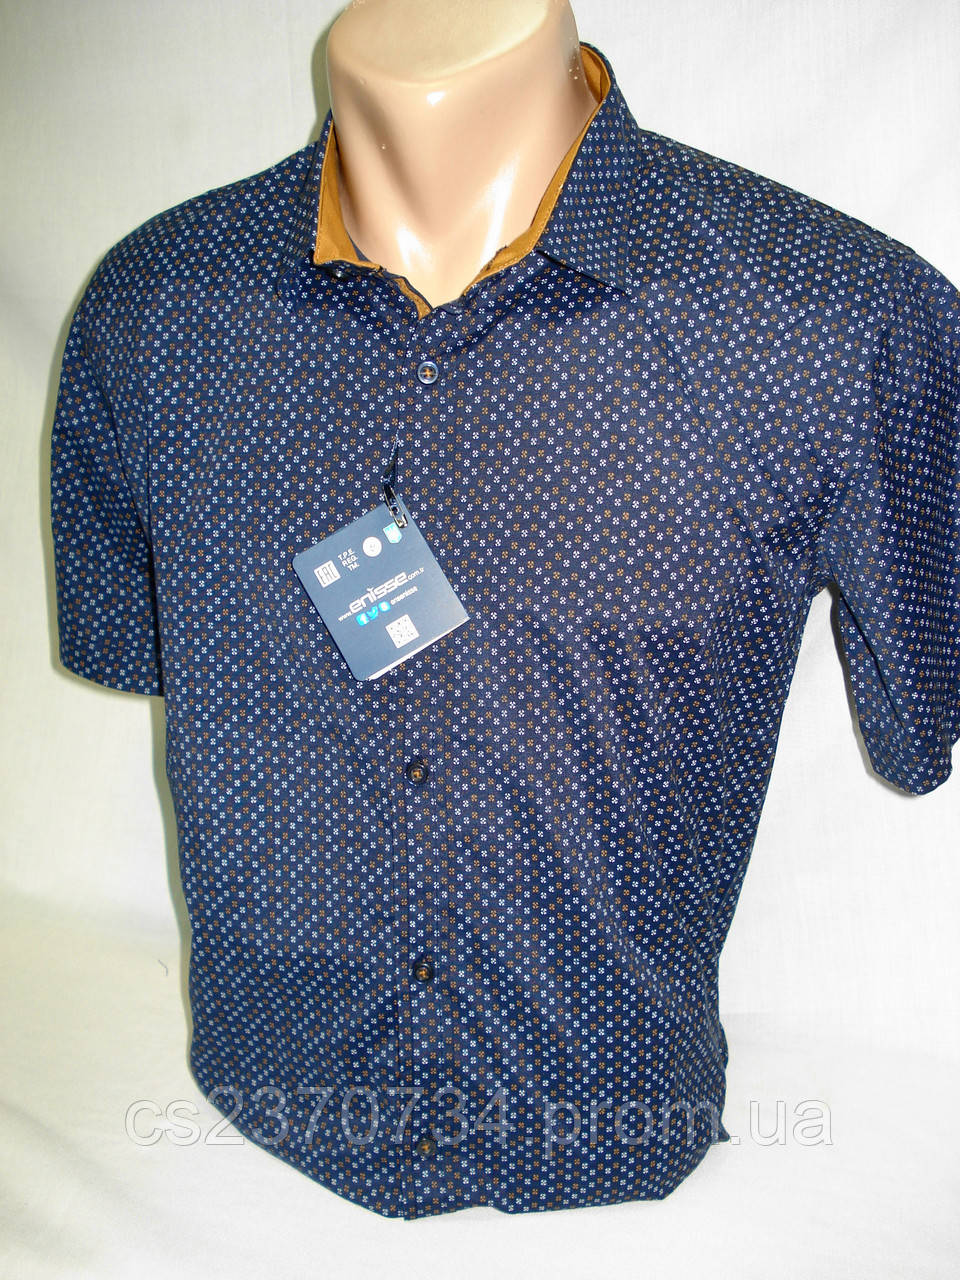 Шведка мужская  Enisse тёмно-синяя c коричневым (разм.S,M,L,XL)